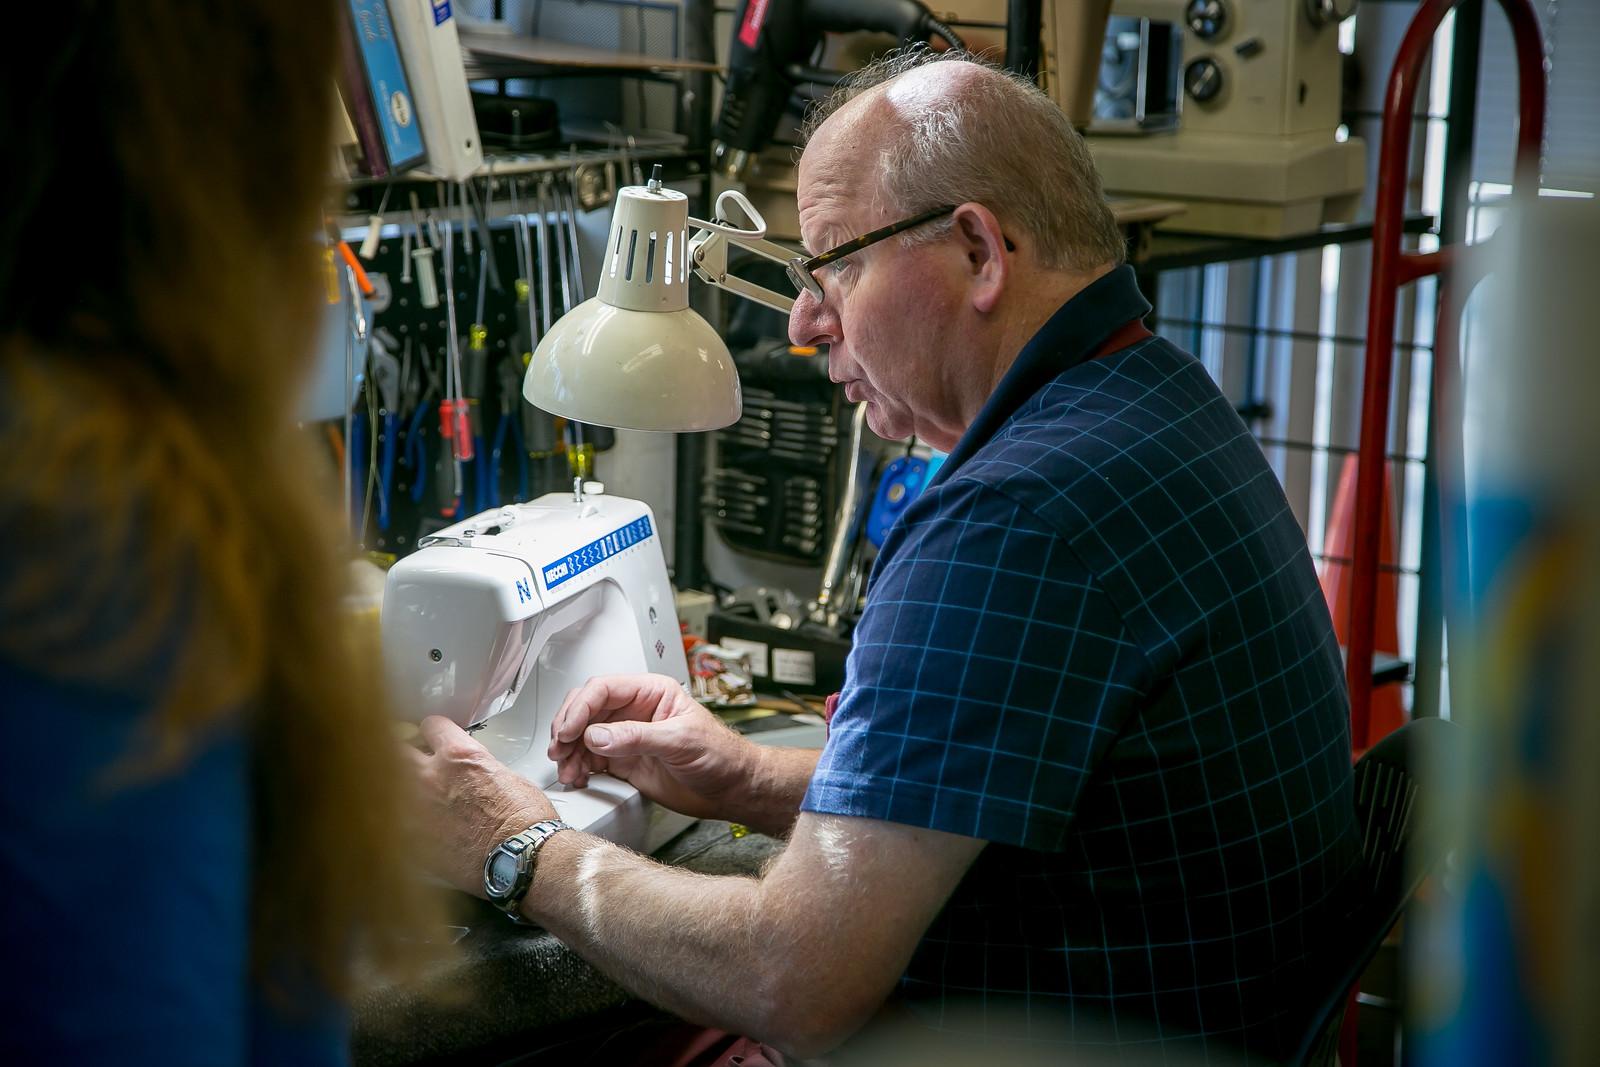 Chris Seegmiller, sewing what?